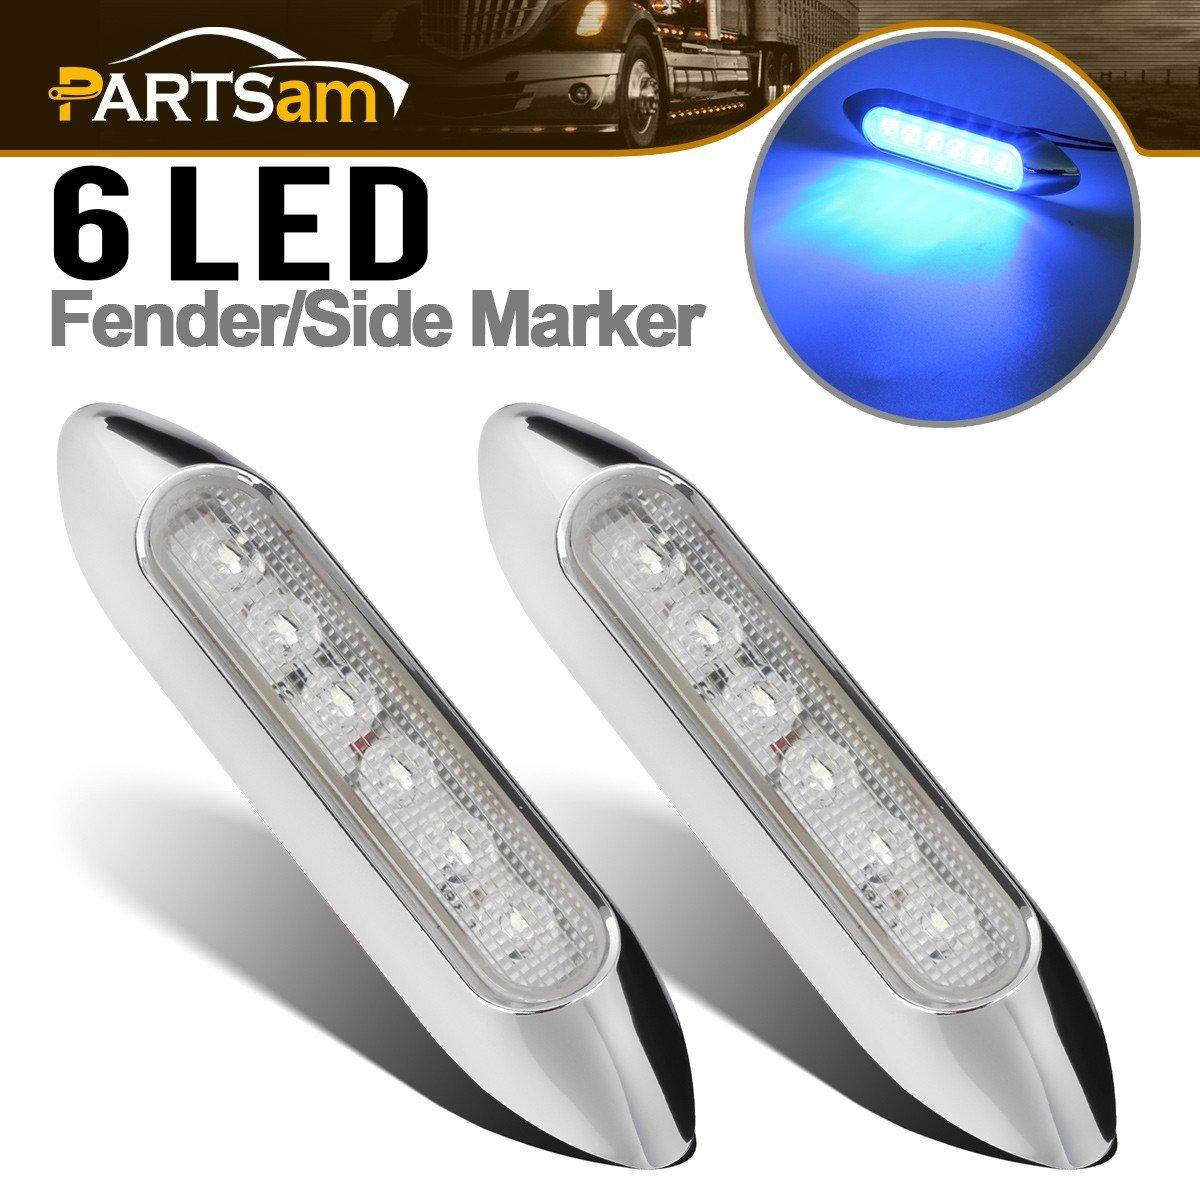 "Partsam 2X Boat Marine 5"" Inch Led Utility Strip Lights Marker 6 Blue LED Sealed Chrome Bezel, Thin Led Courtesy Rock Lights 12V DC"